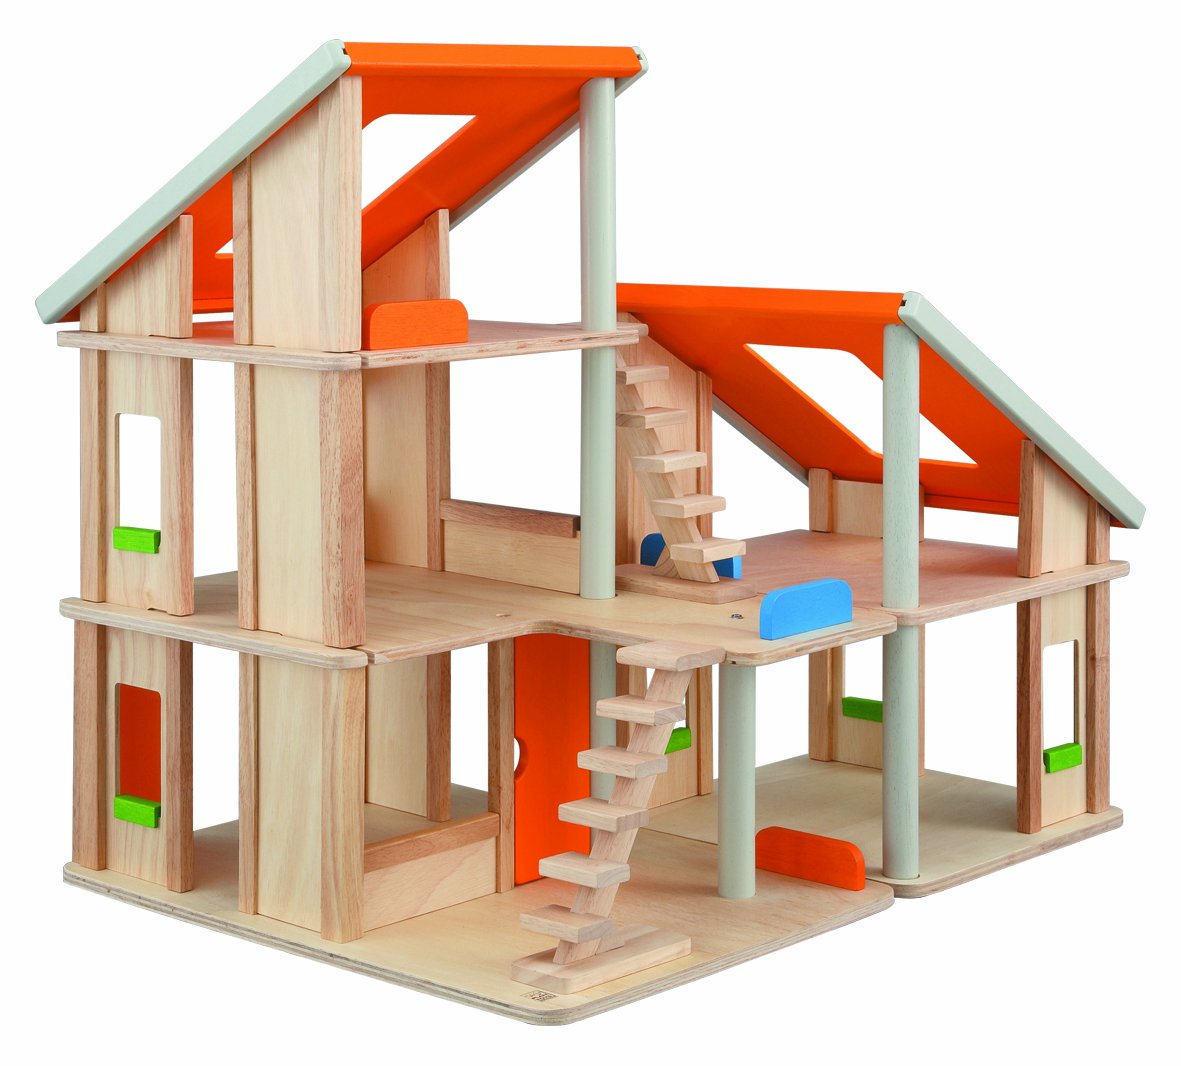 amazoncom plantoys chalet dollhouse toys  games -